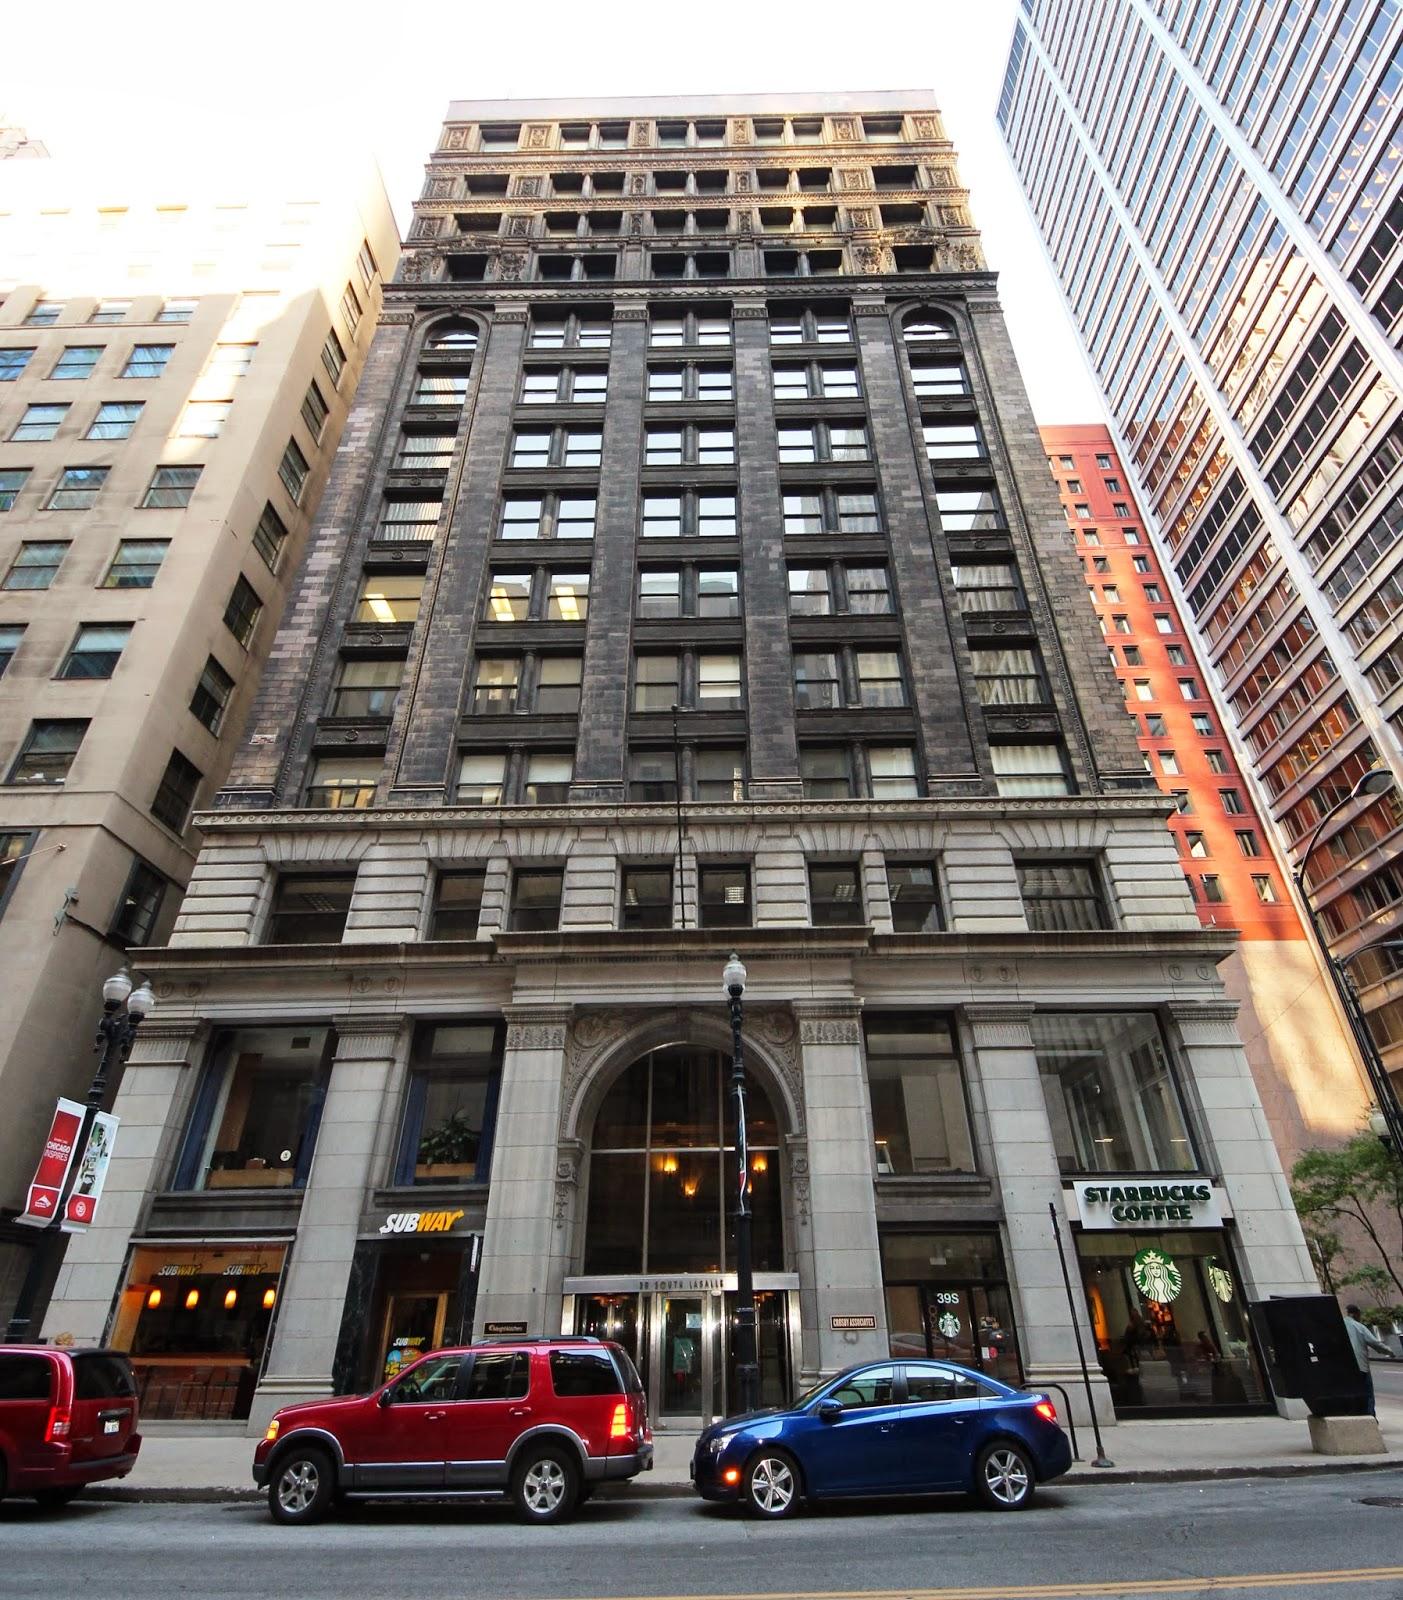 New Apartment Buildings Chicago: Environment Art Of Matthew Macer: Hitman: Absolution